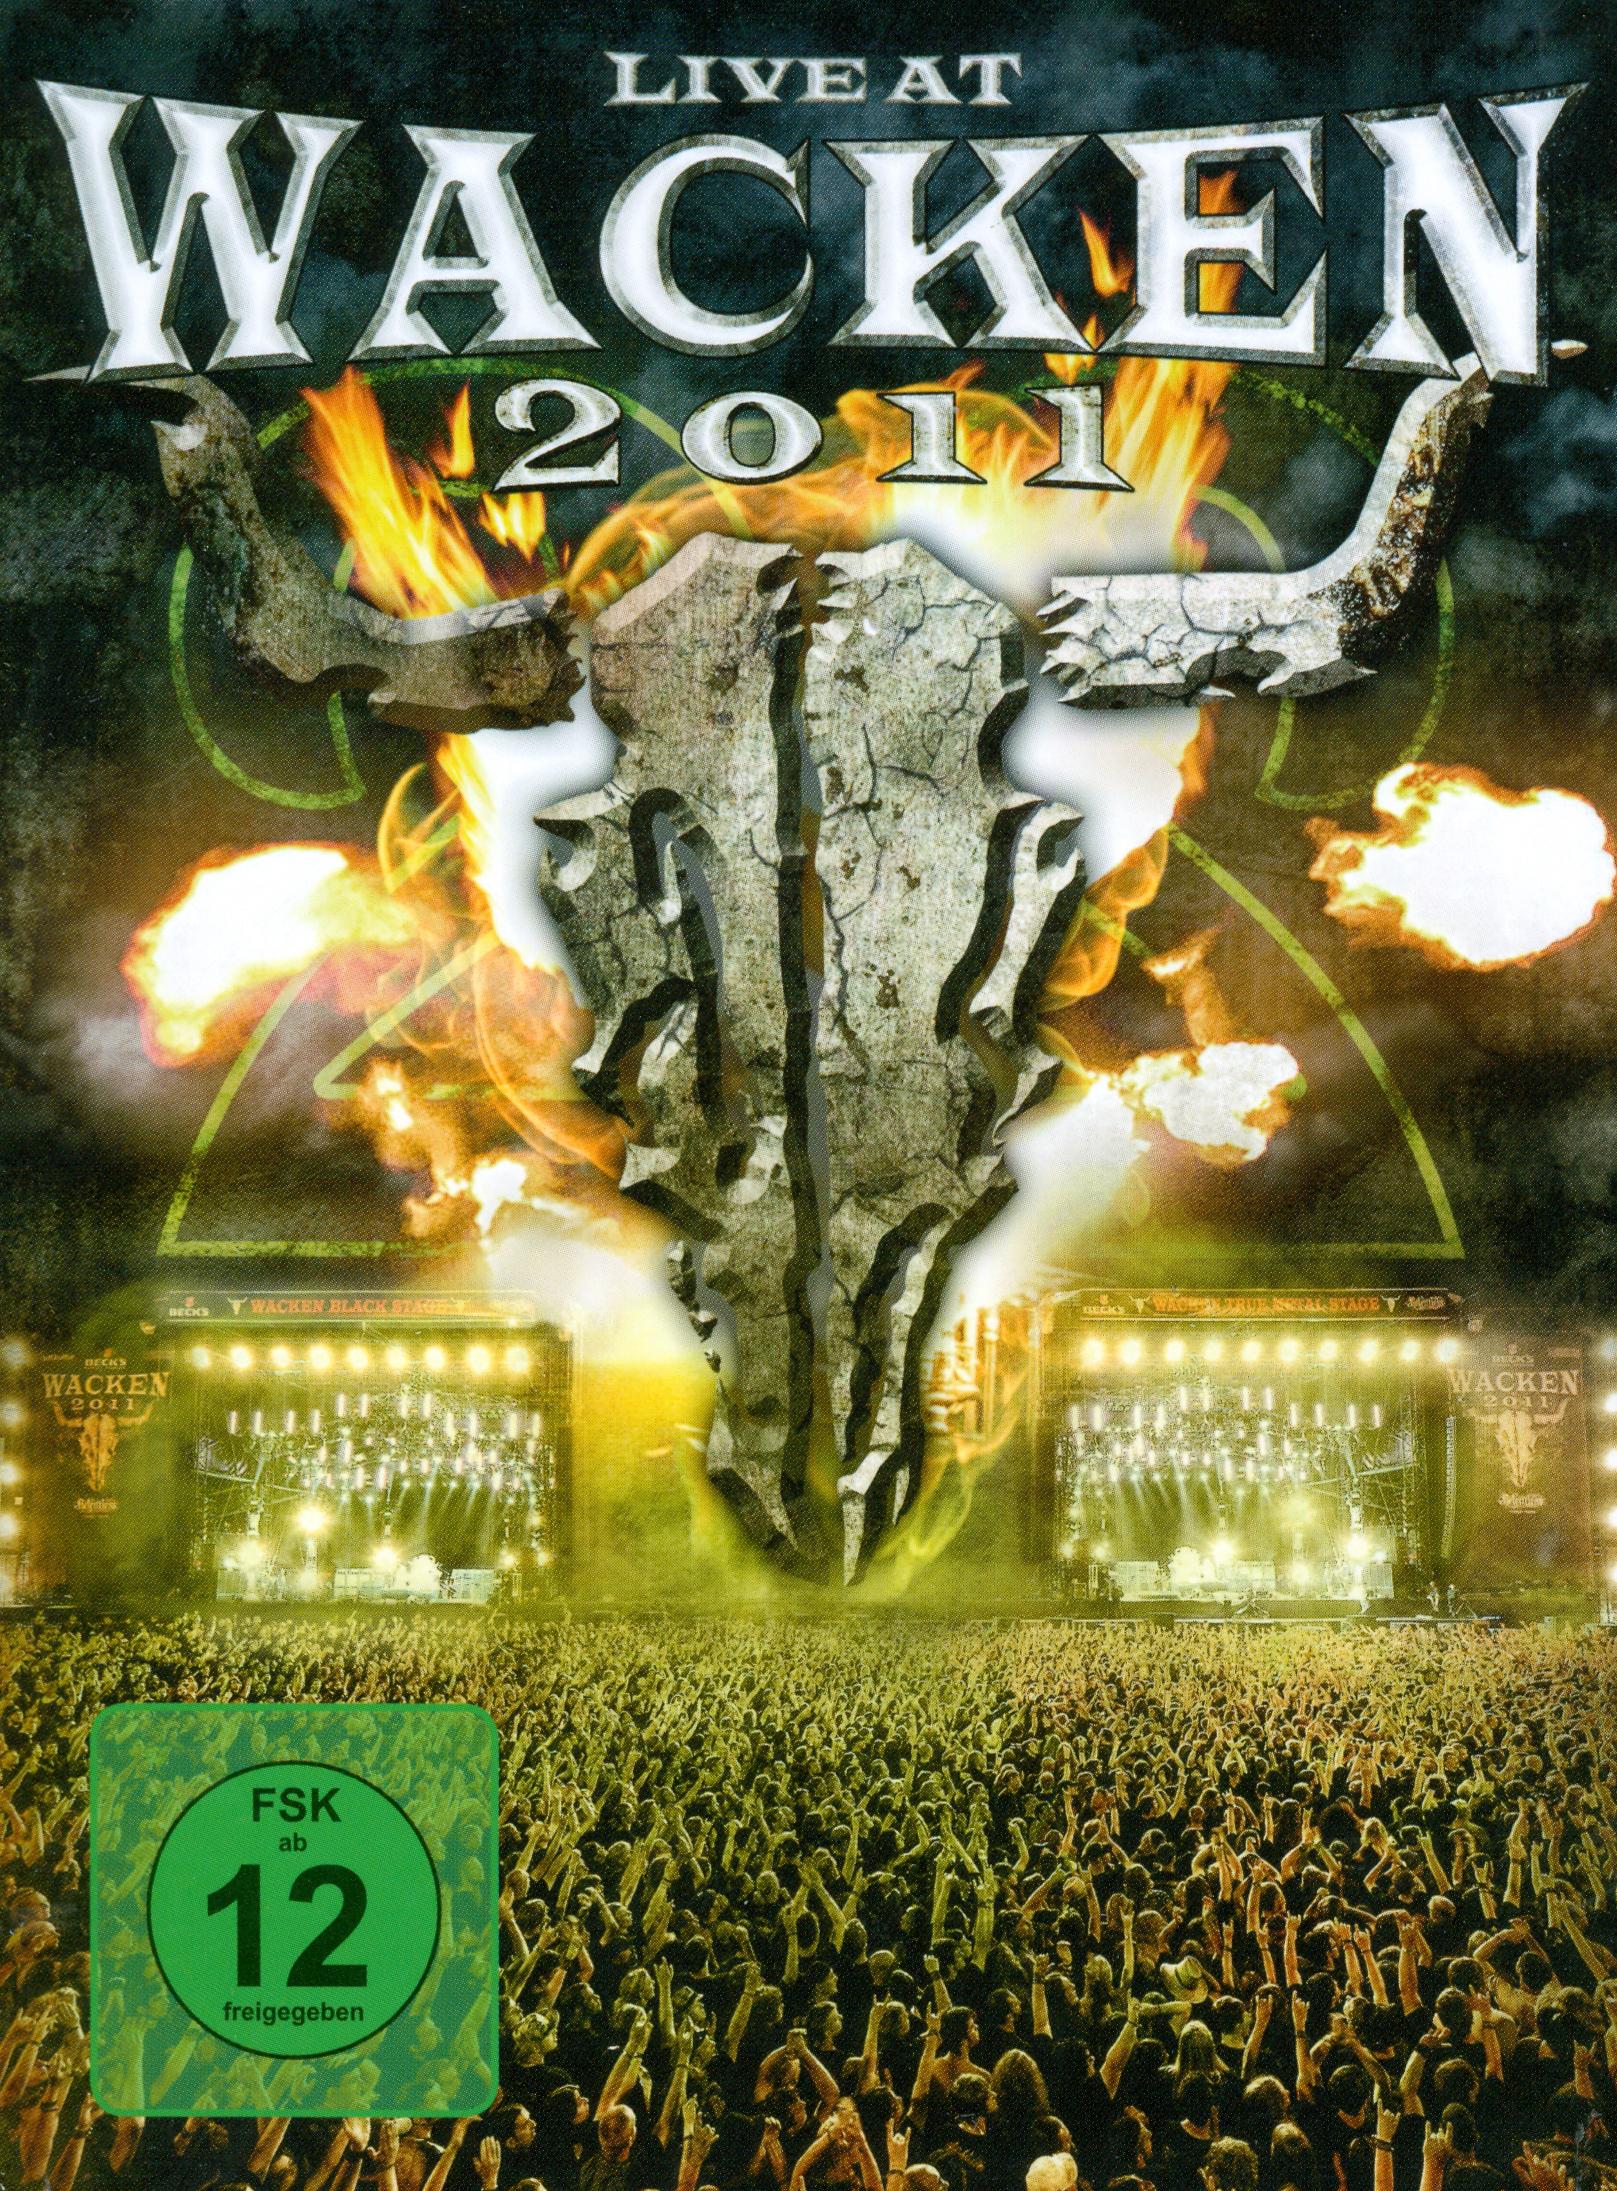 Live at Wacken 2011